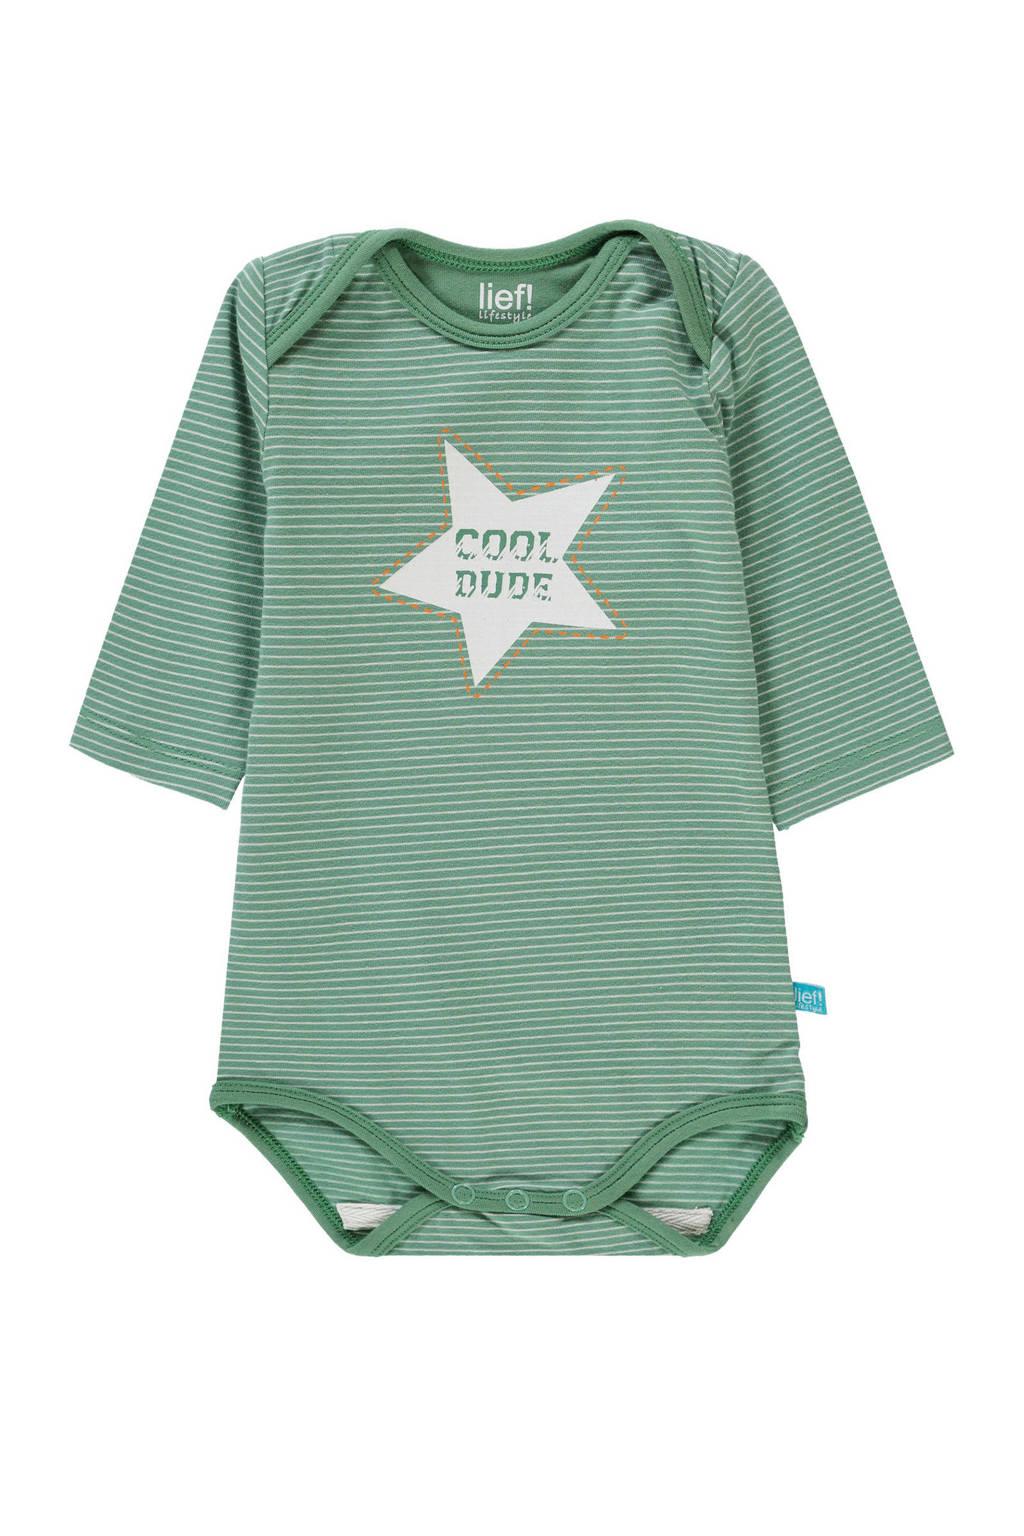 lief! newborn gestreepte romper met tekst groen, Groen/wit